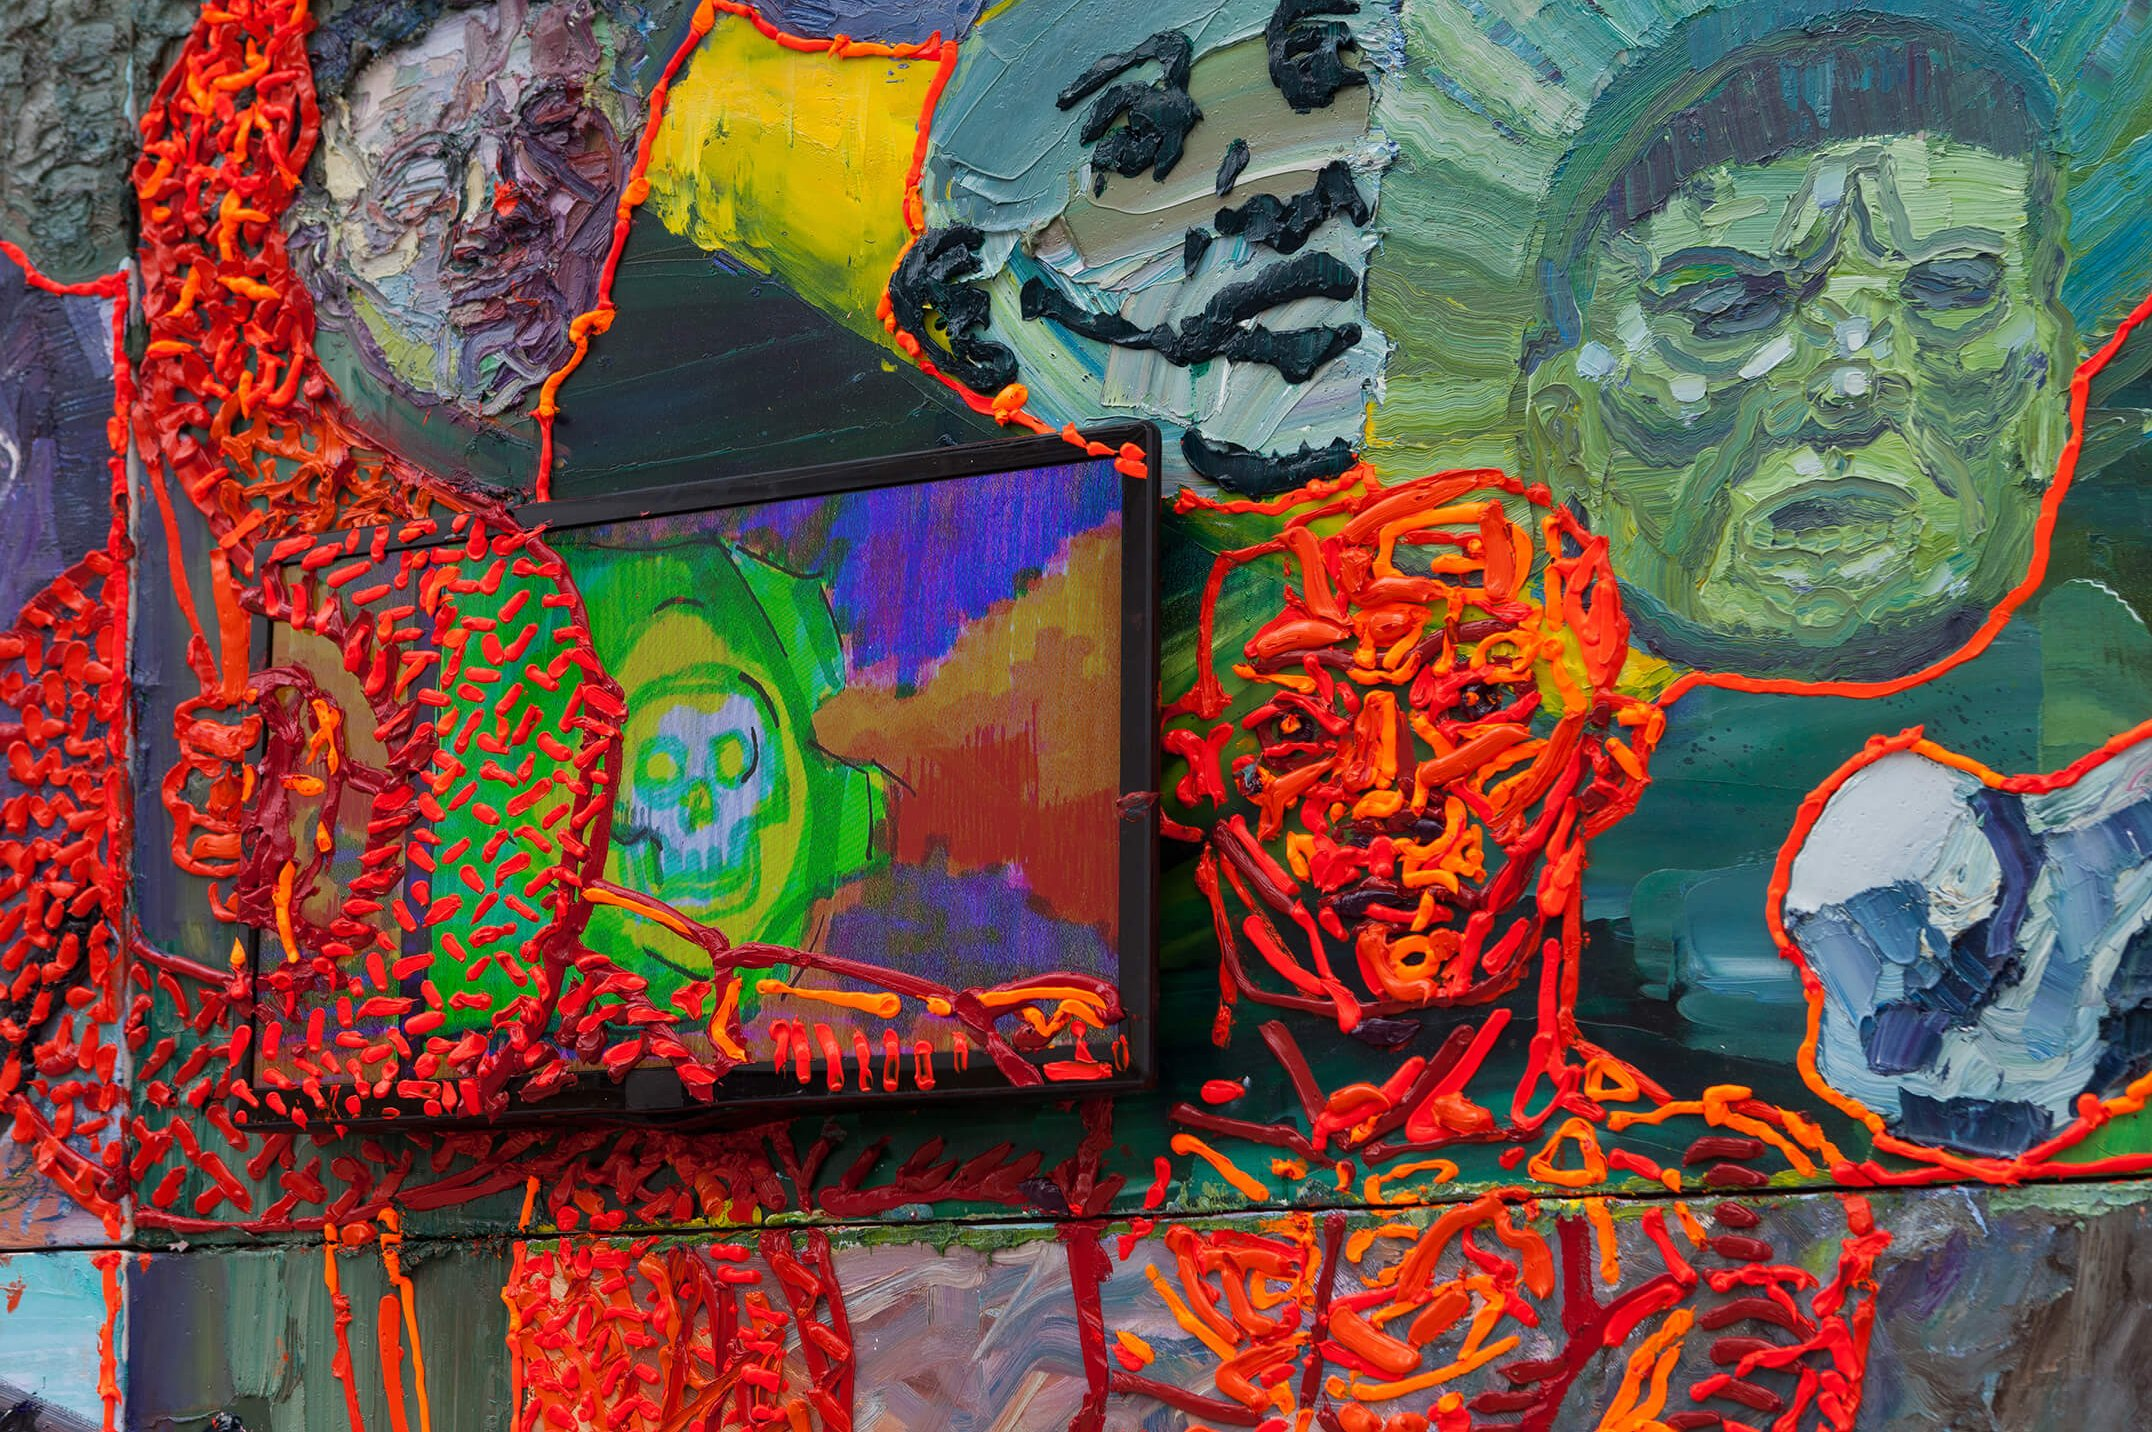 Thiago Martins de Melo,<em>A biga do porta-bandeira vermelho,</em>2016,oil on canvas, polyester and polyurethane resin, two tv monitors with stop motion animation,260 × 360 cm - Mendes Wood DM